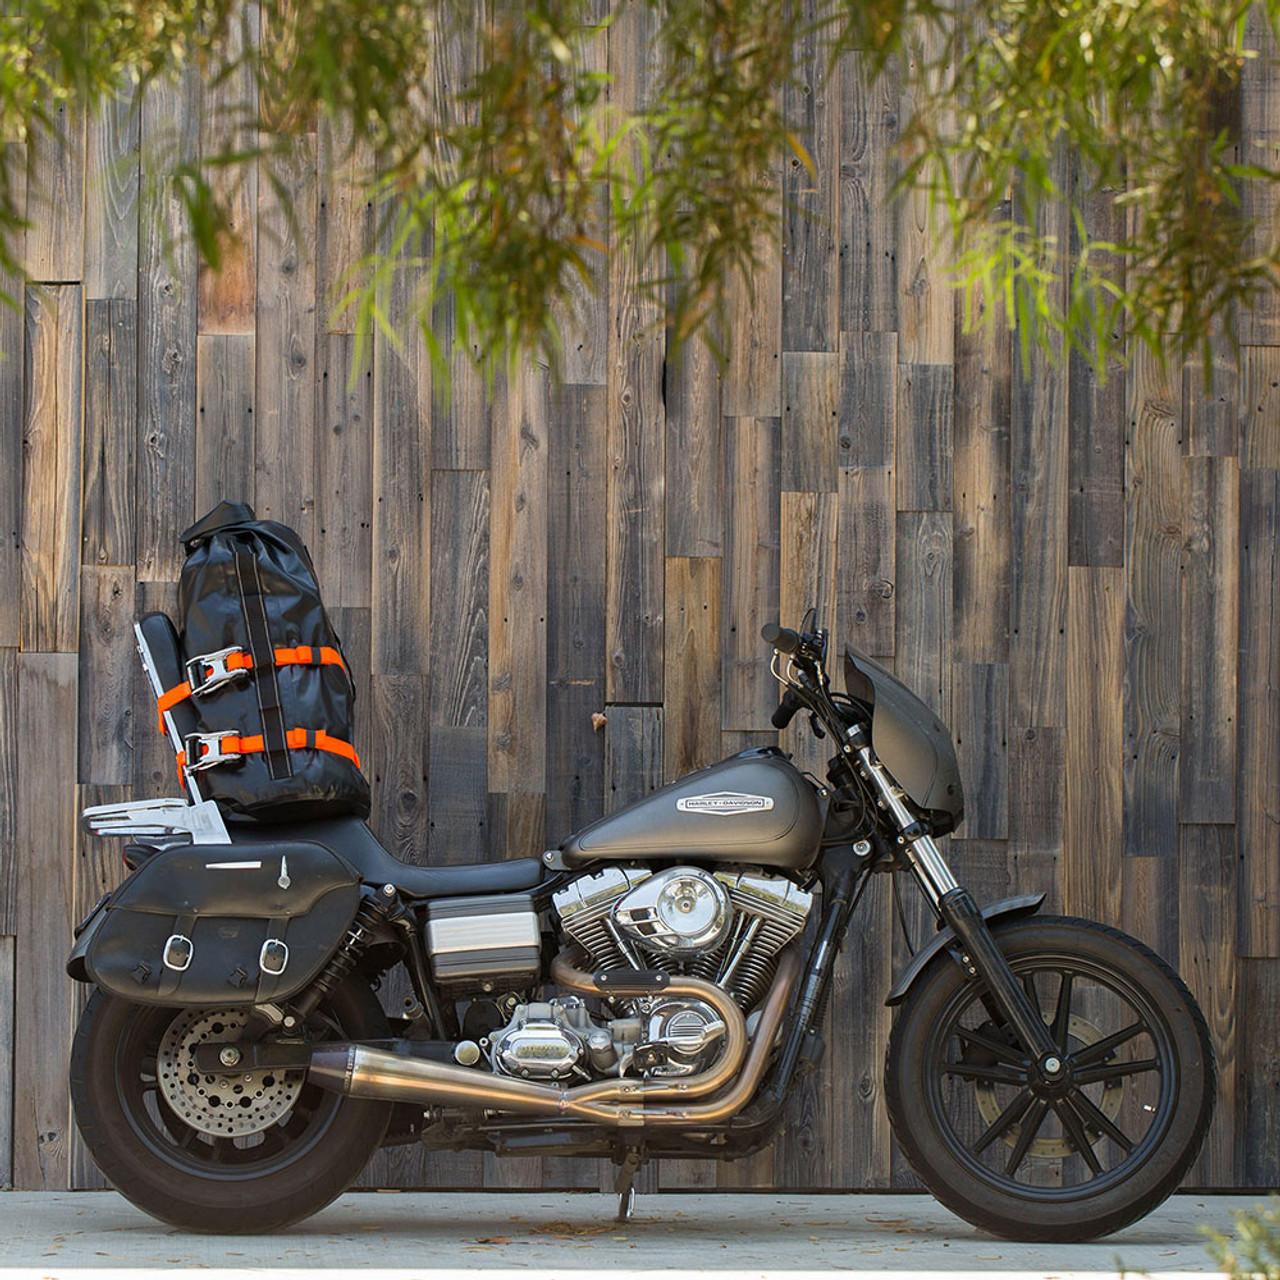 BAG MOTORCYCLE EXFIL 115B 3004-01 BILTWELL INC